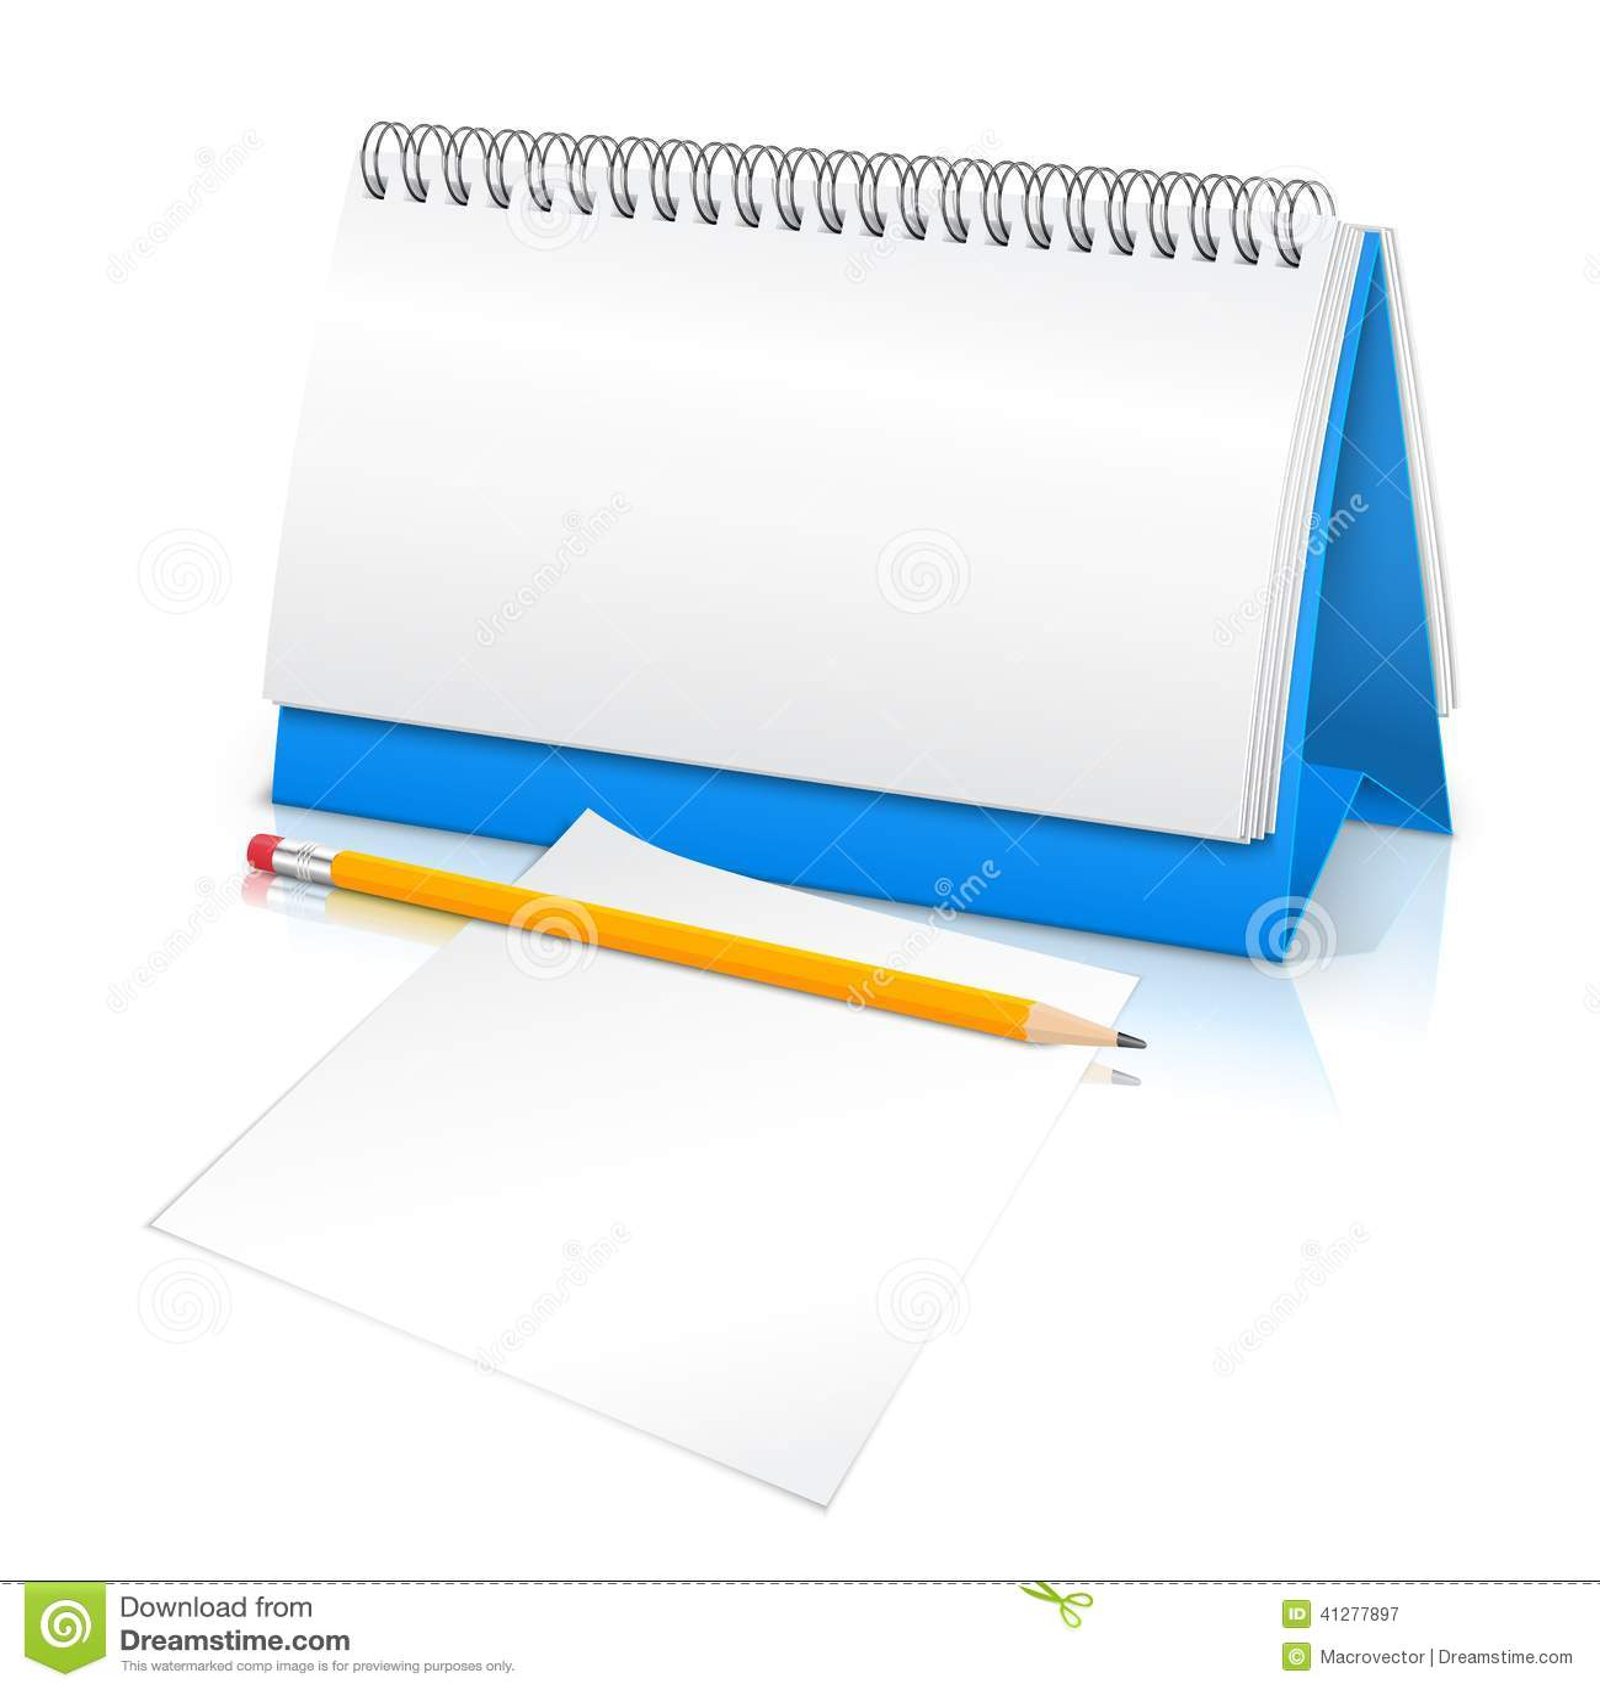 Event Calendar Illustration : Desk calendar mockup stock vector illustration of event